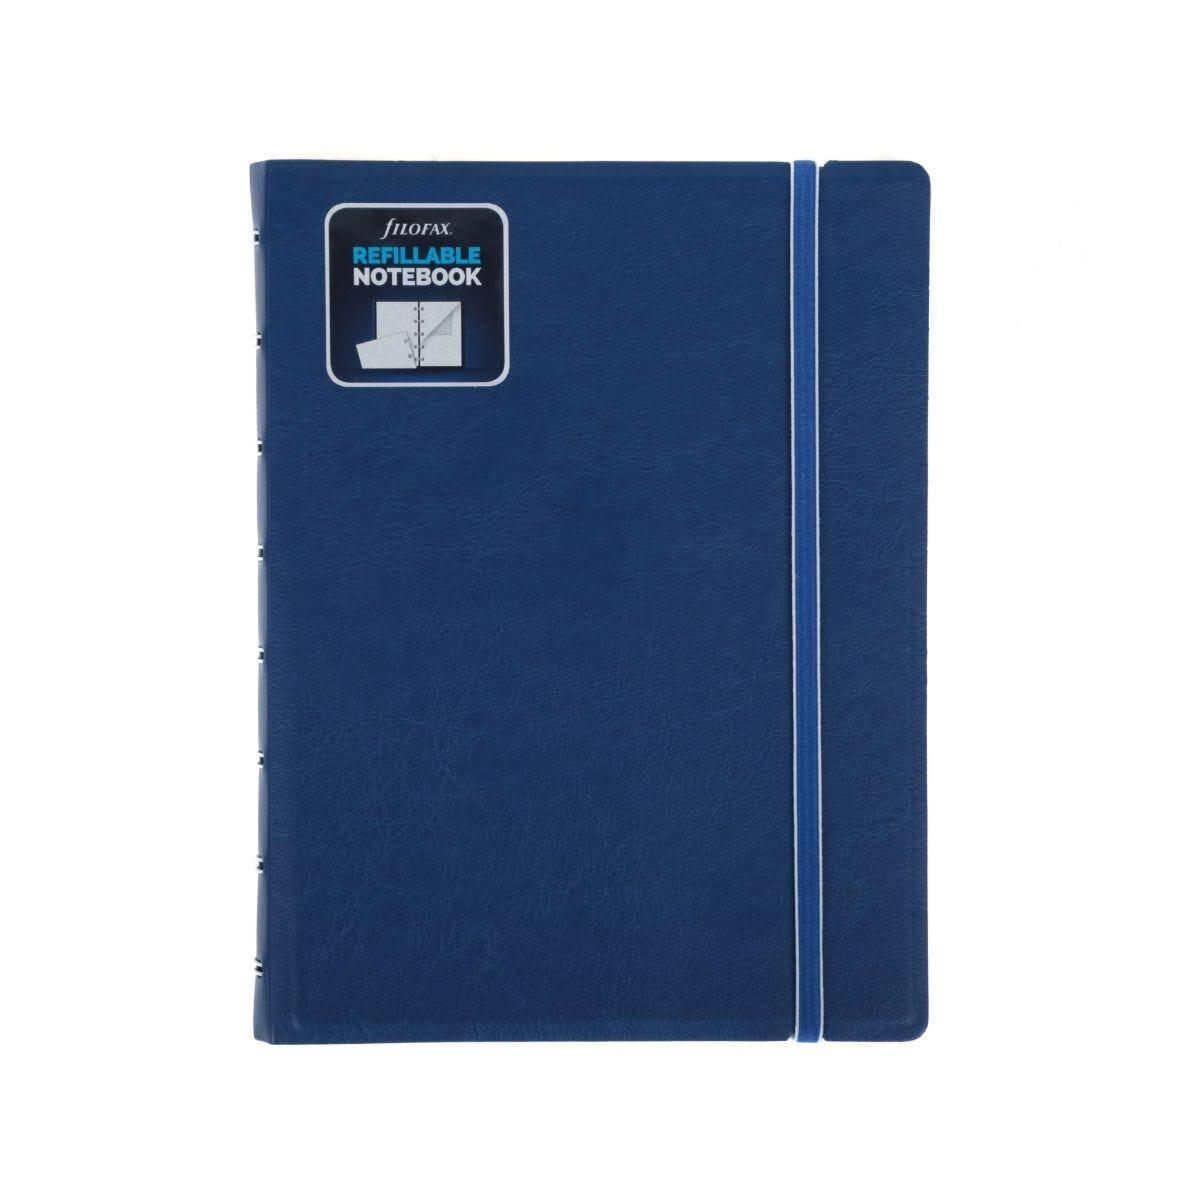 Filofax Refillable Notebook A5 Blue